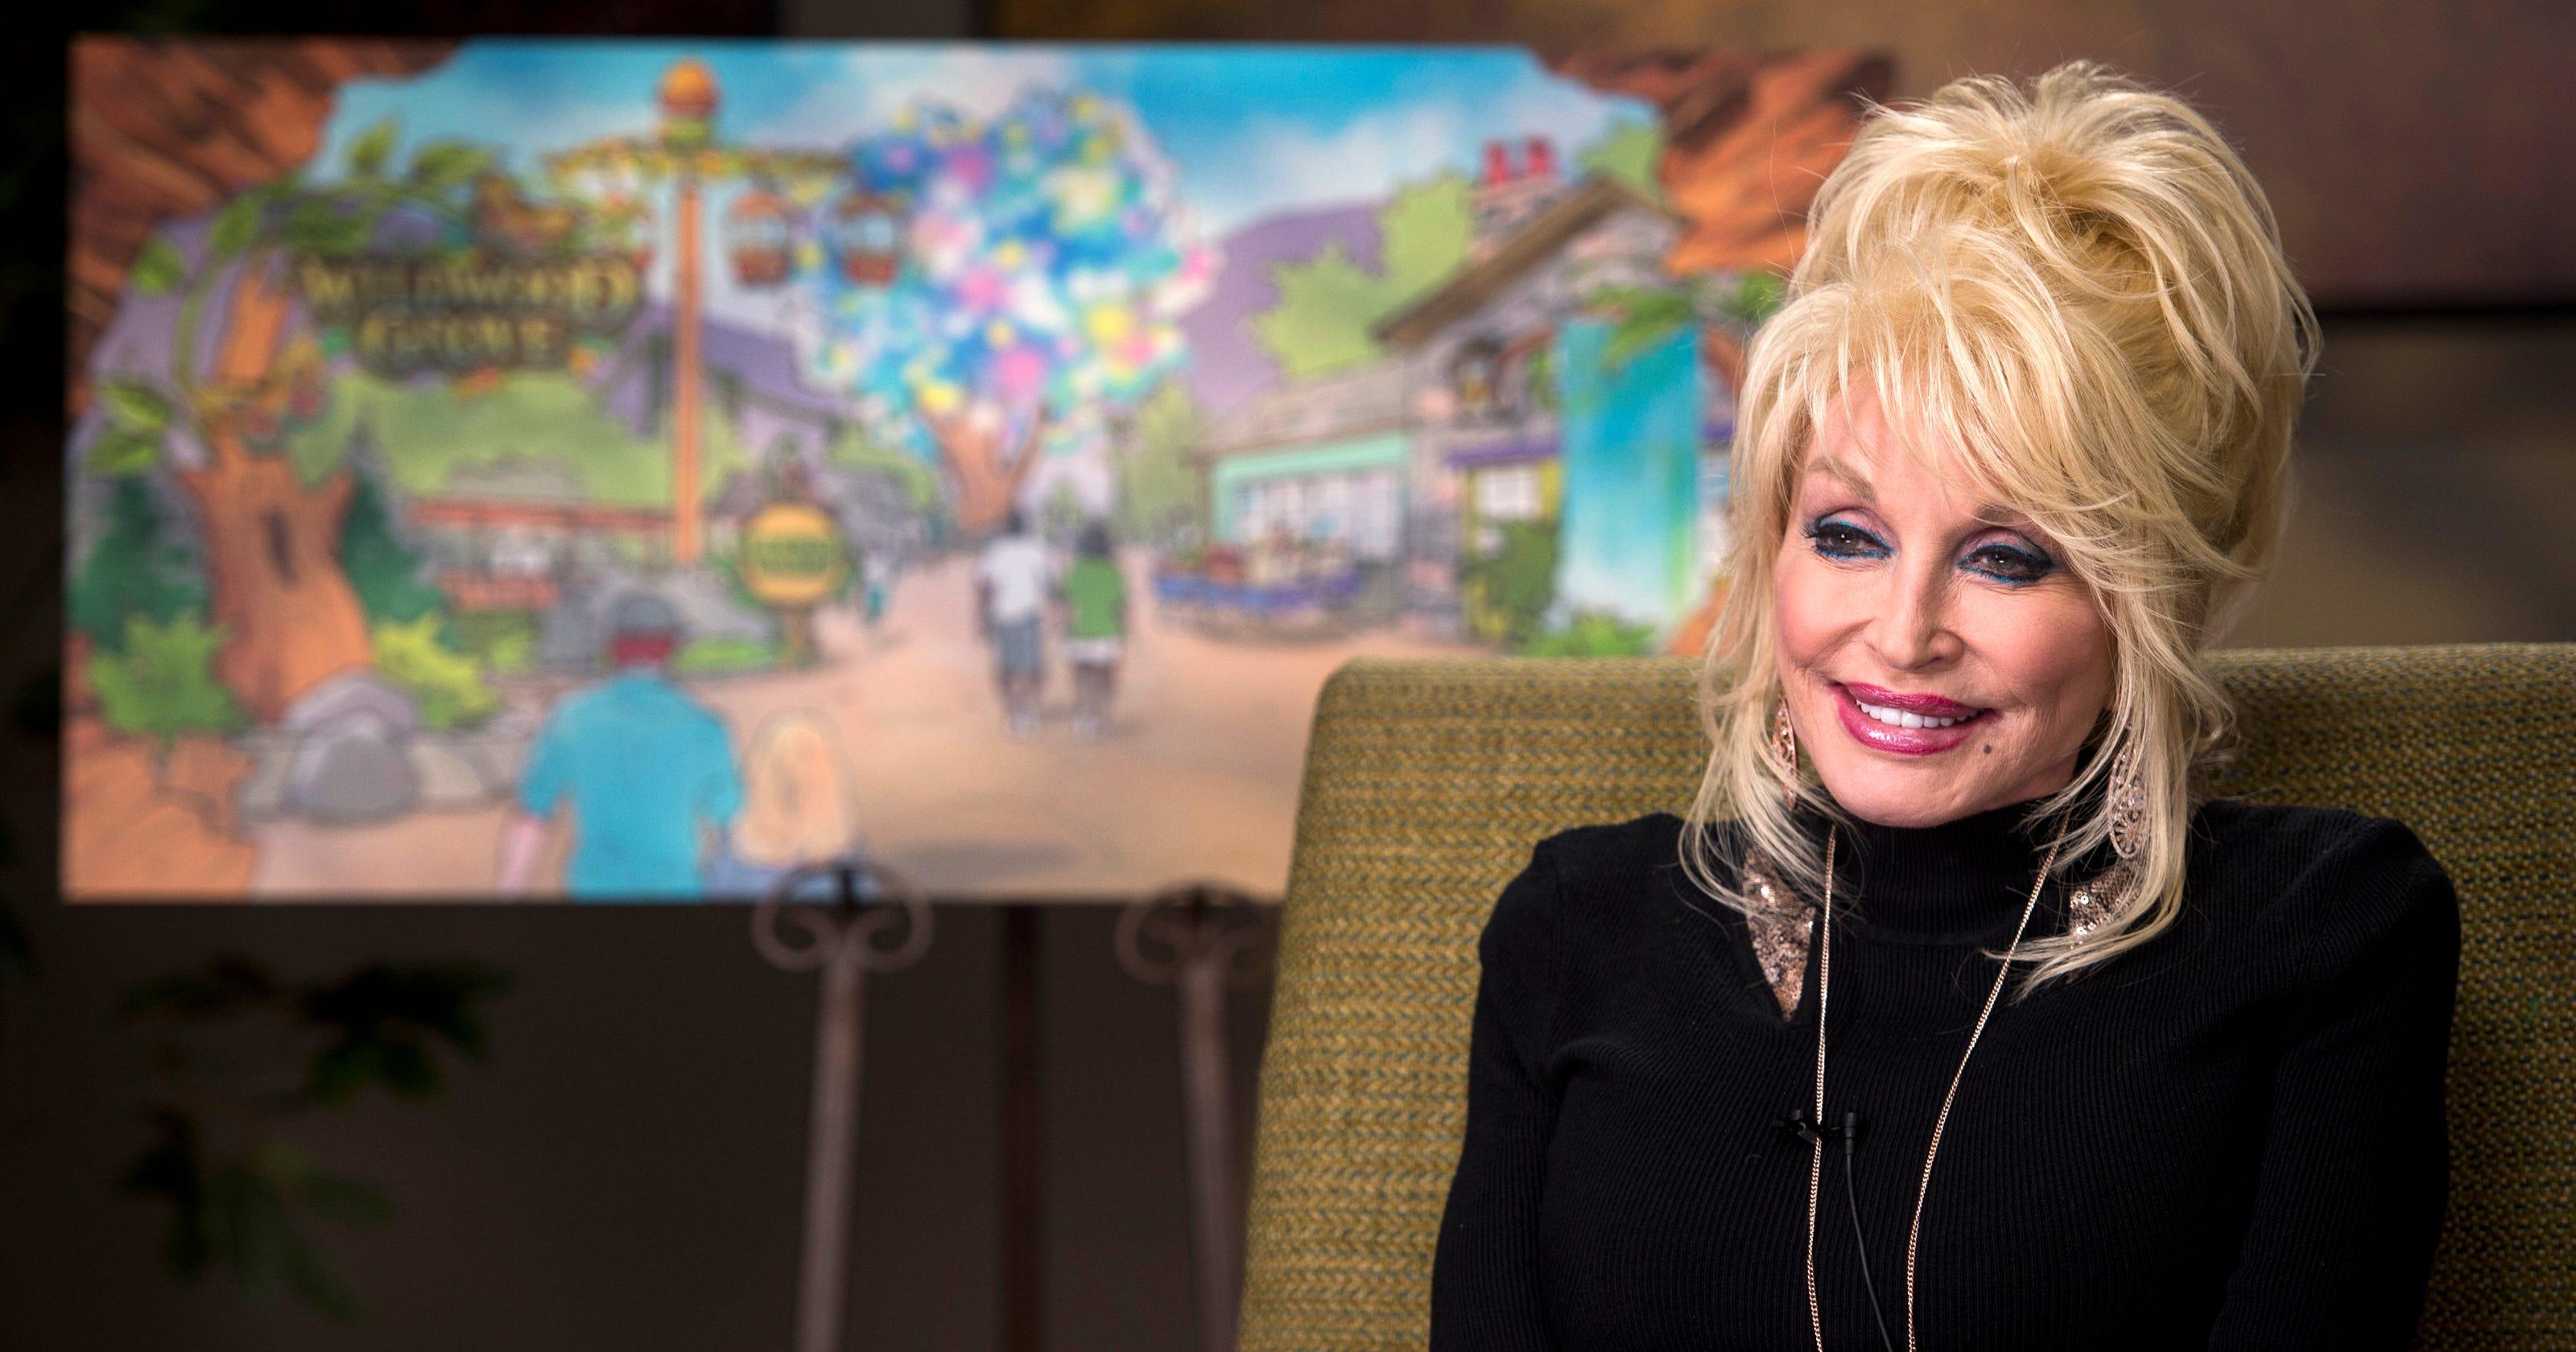 Dolly Parton announces largest Dollywood park expansion